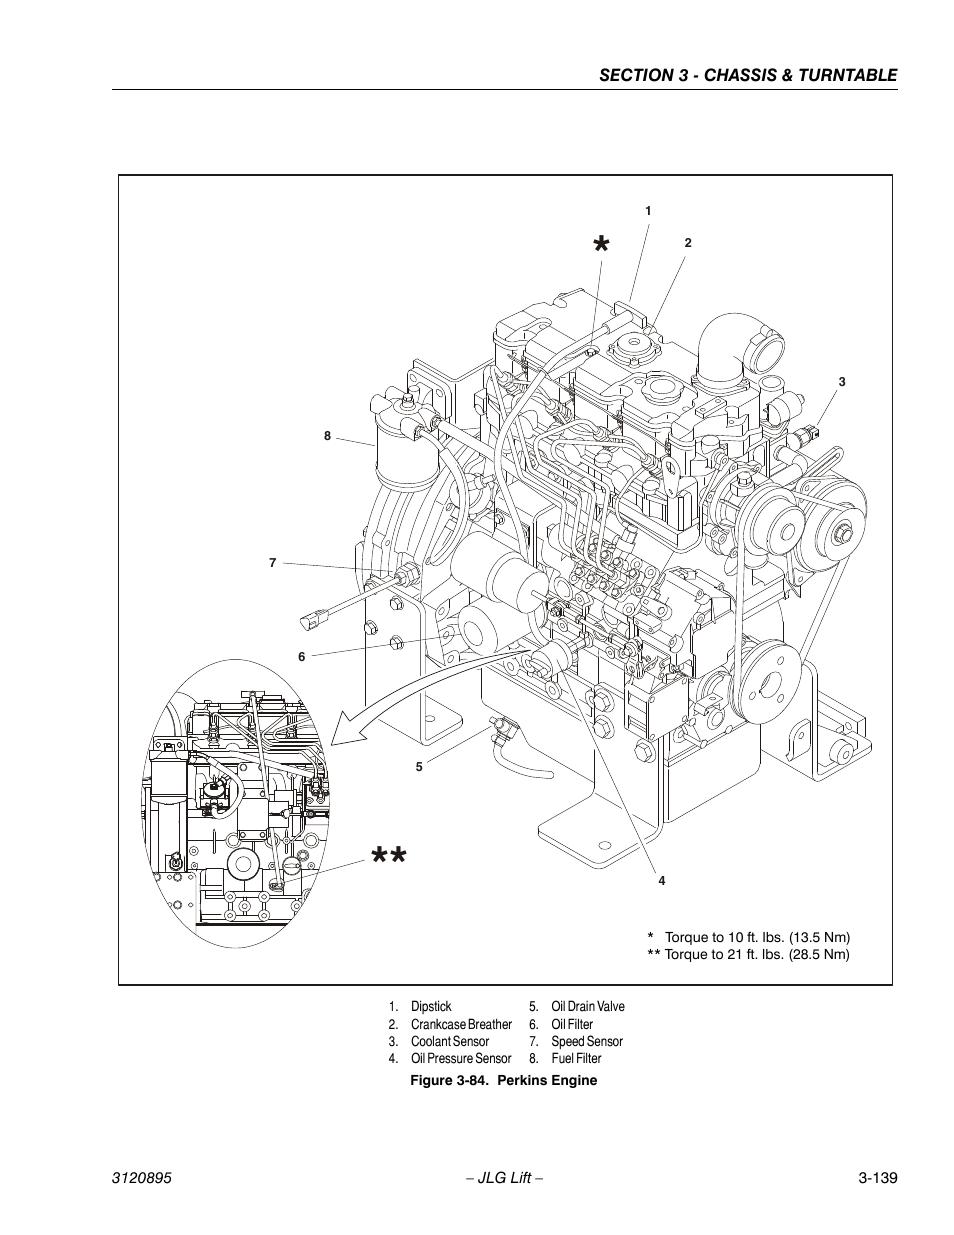 hight resolution of perkins engine 139 jlg 460sj service manual user manual page 191 462